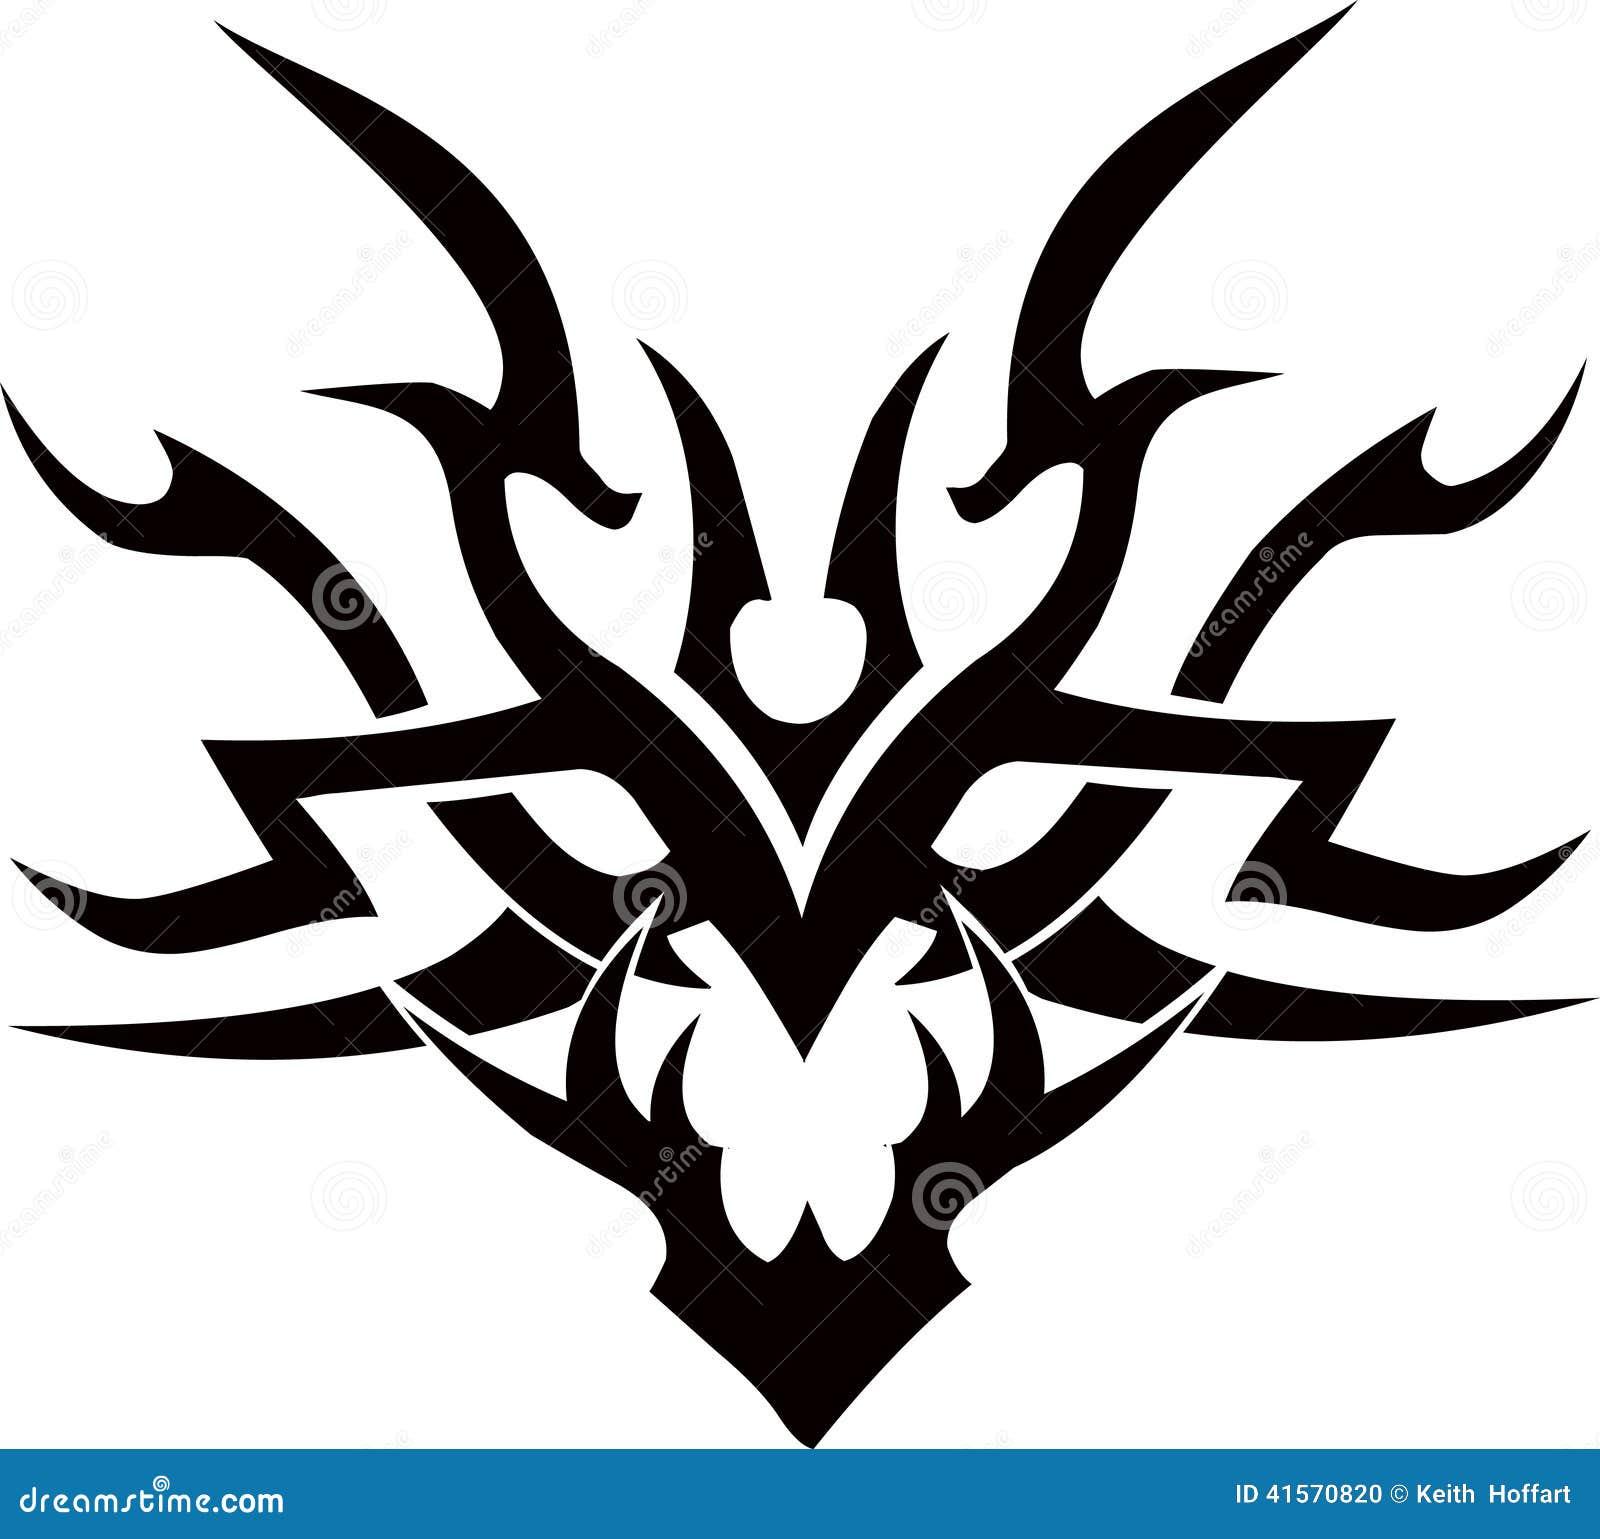 Tribal Tattoo Vector Design Illustration Face Stock Vector